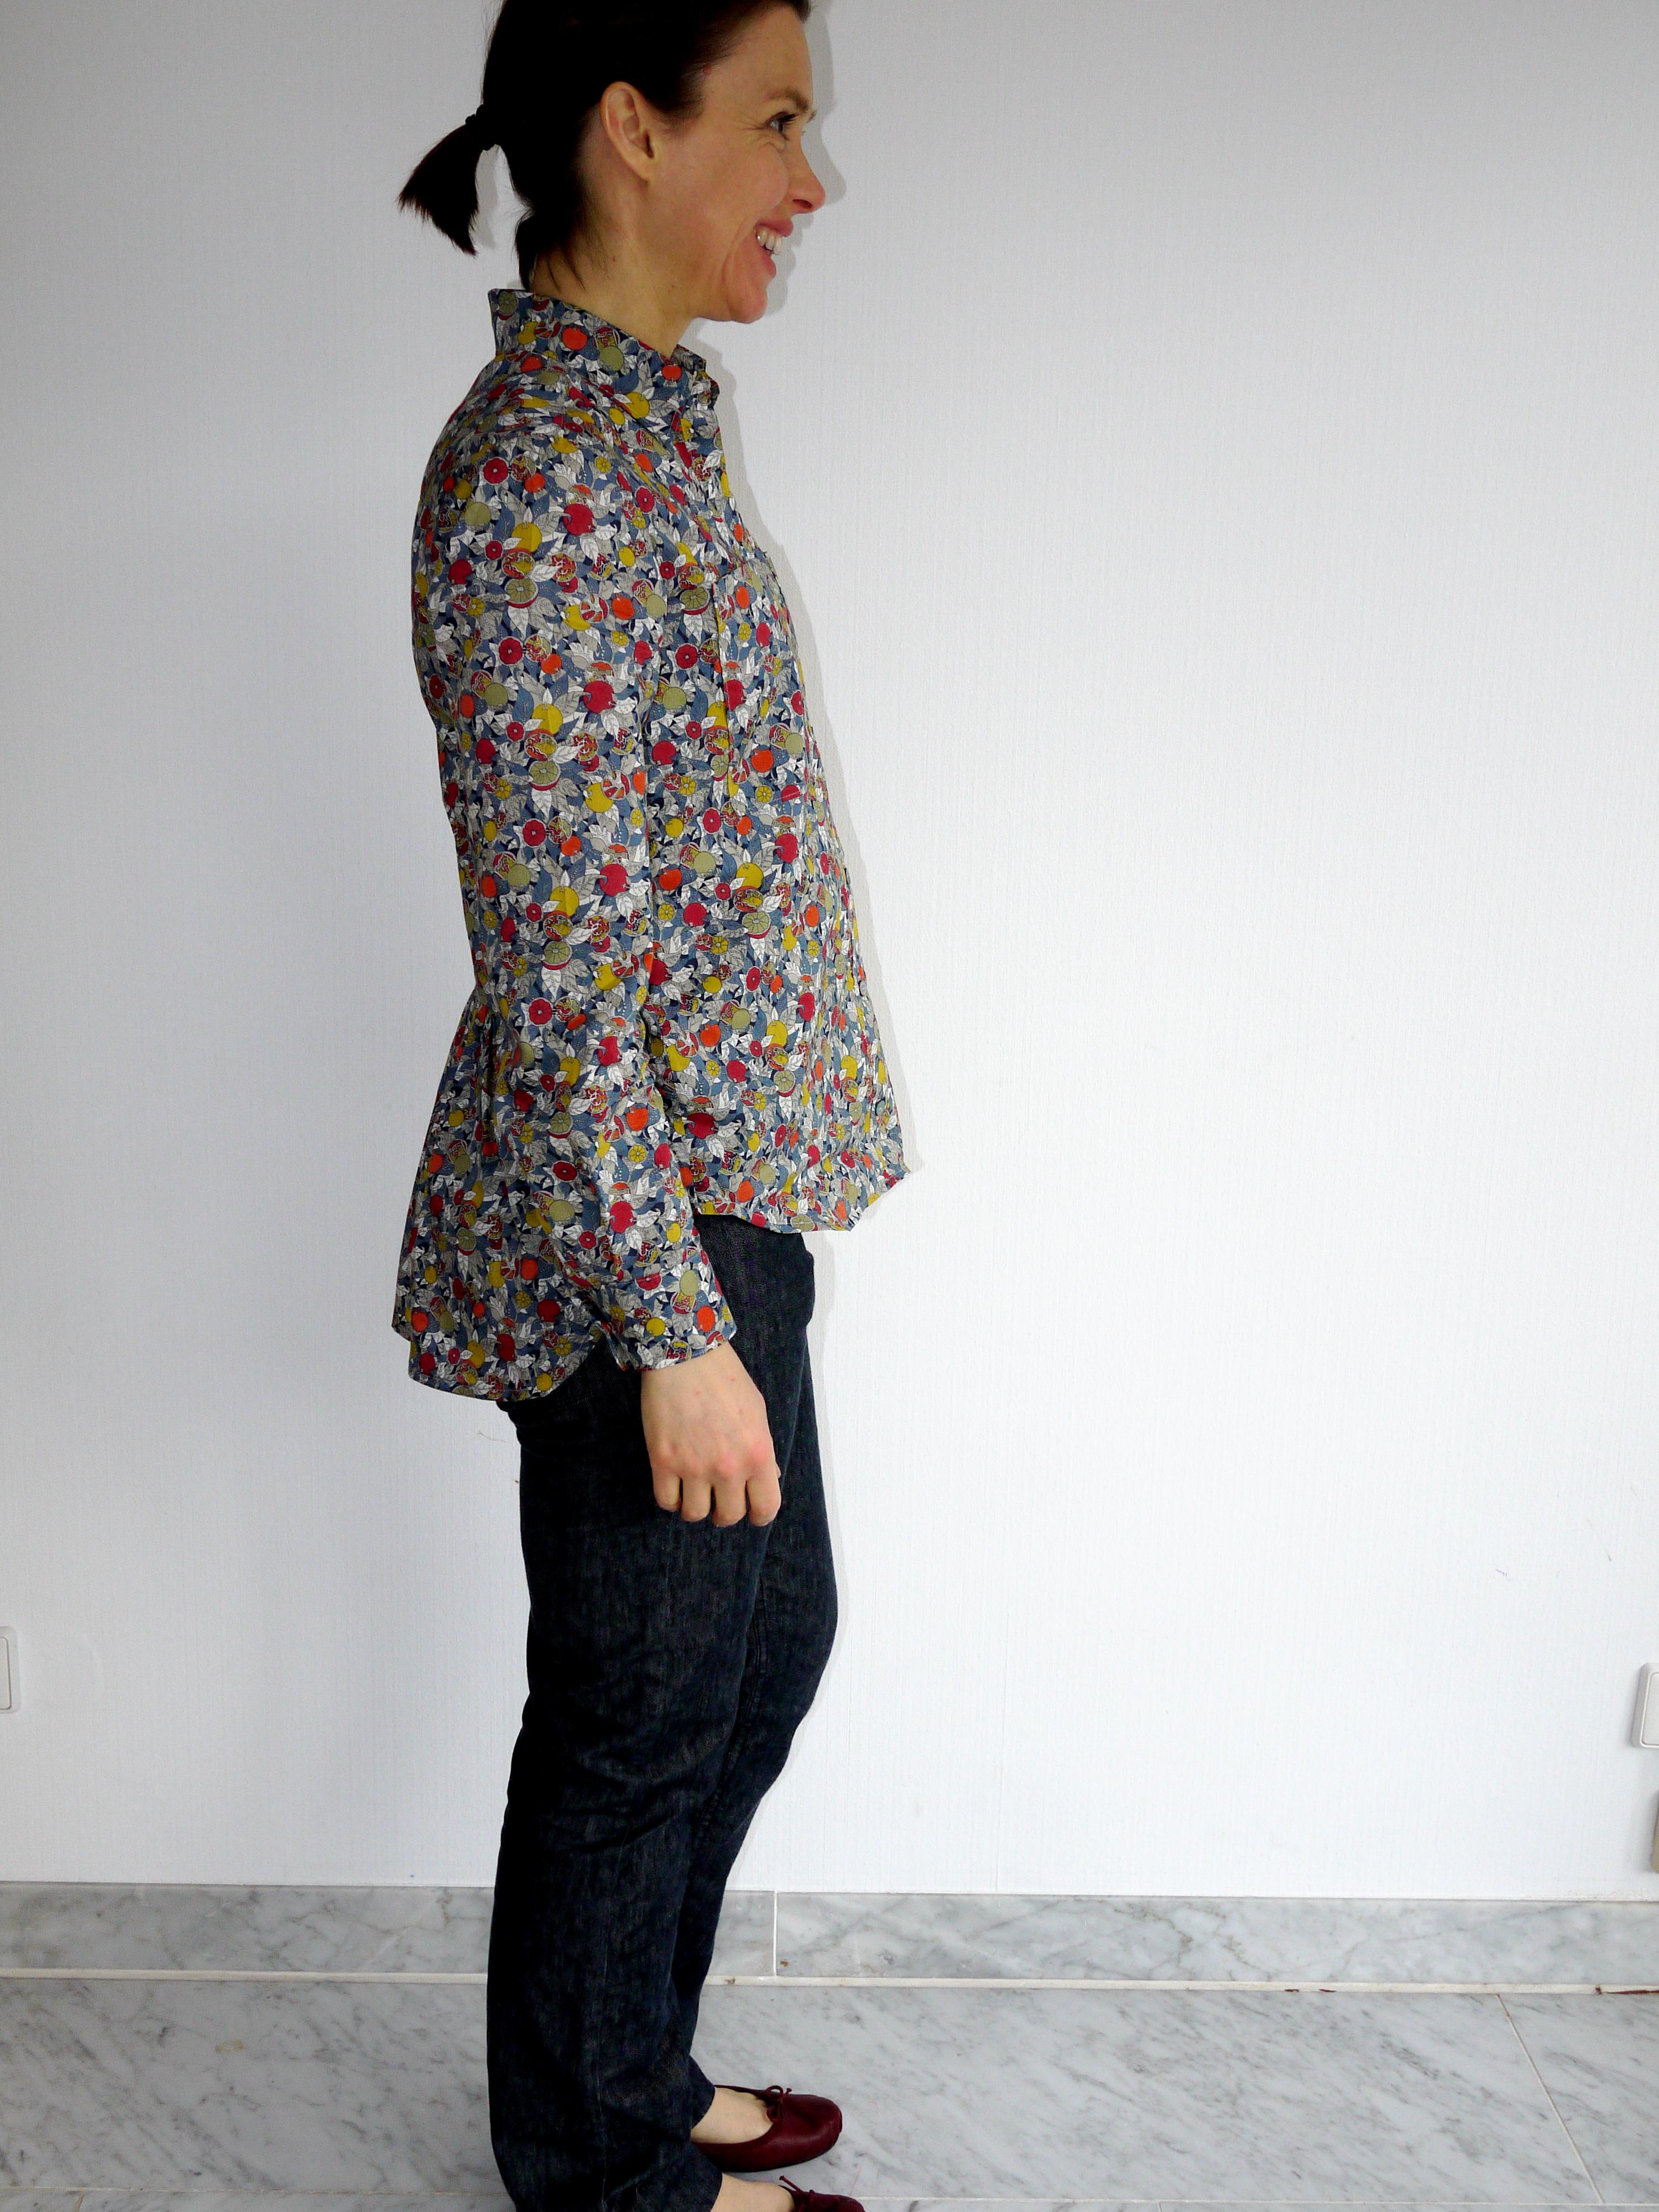 Archer shirt by Grainline Studios View B